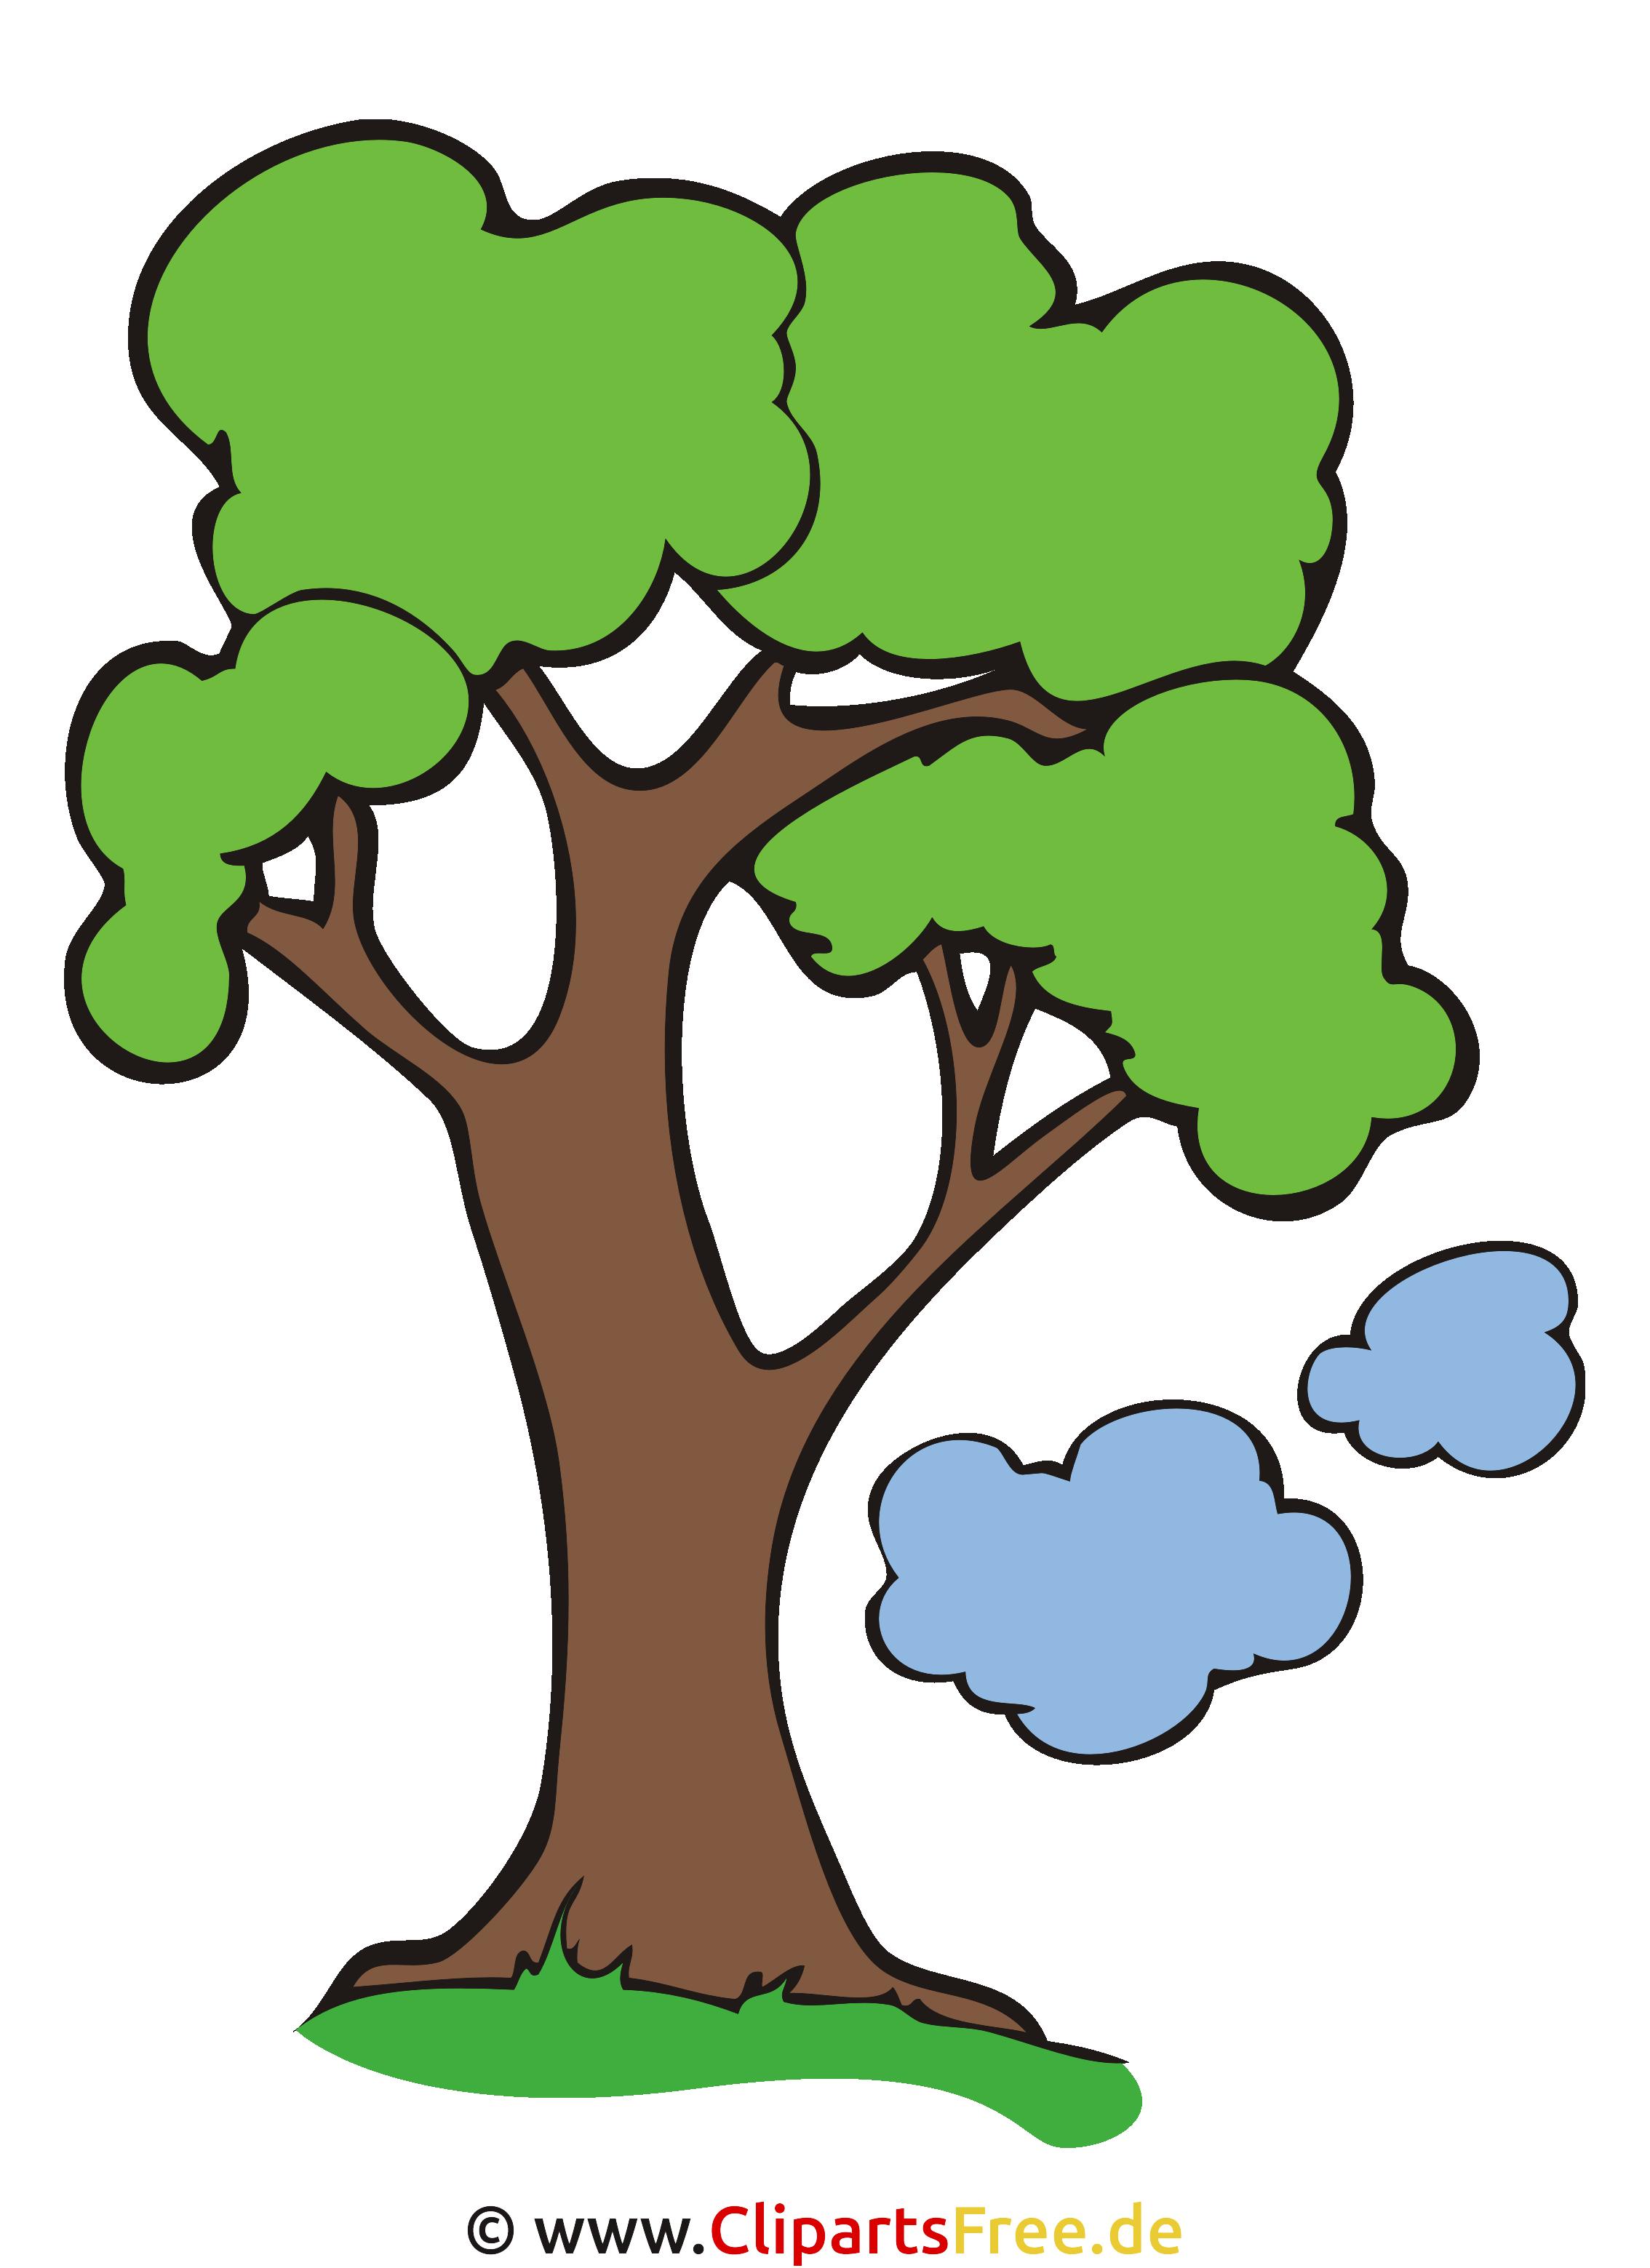 Baum Clipart, Bild, Cartoon, Grafik, Illustration